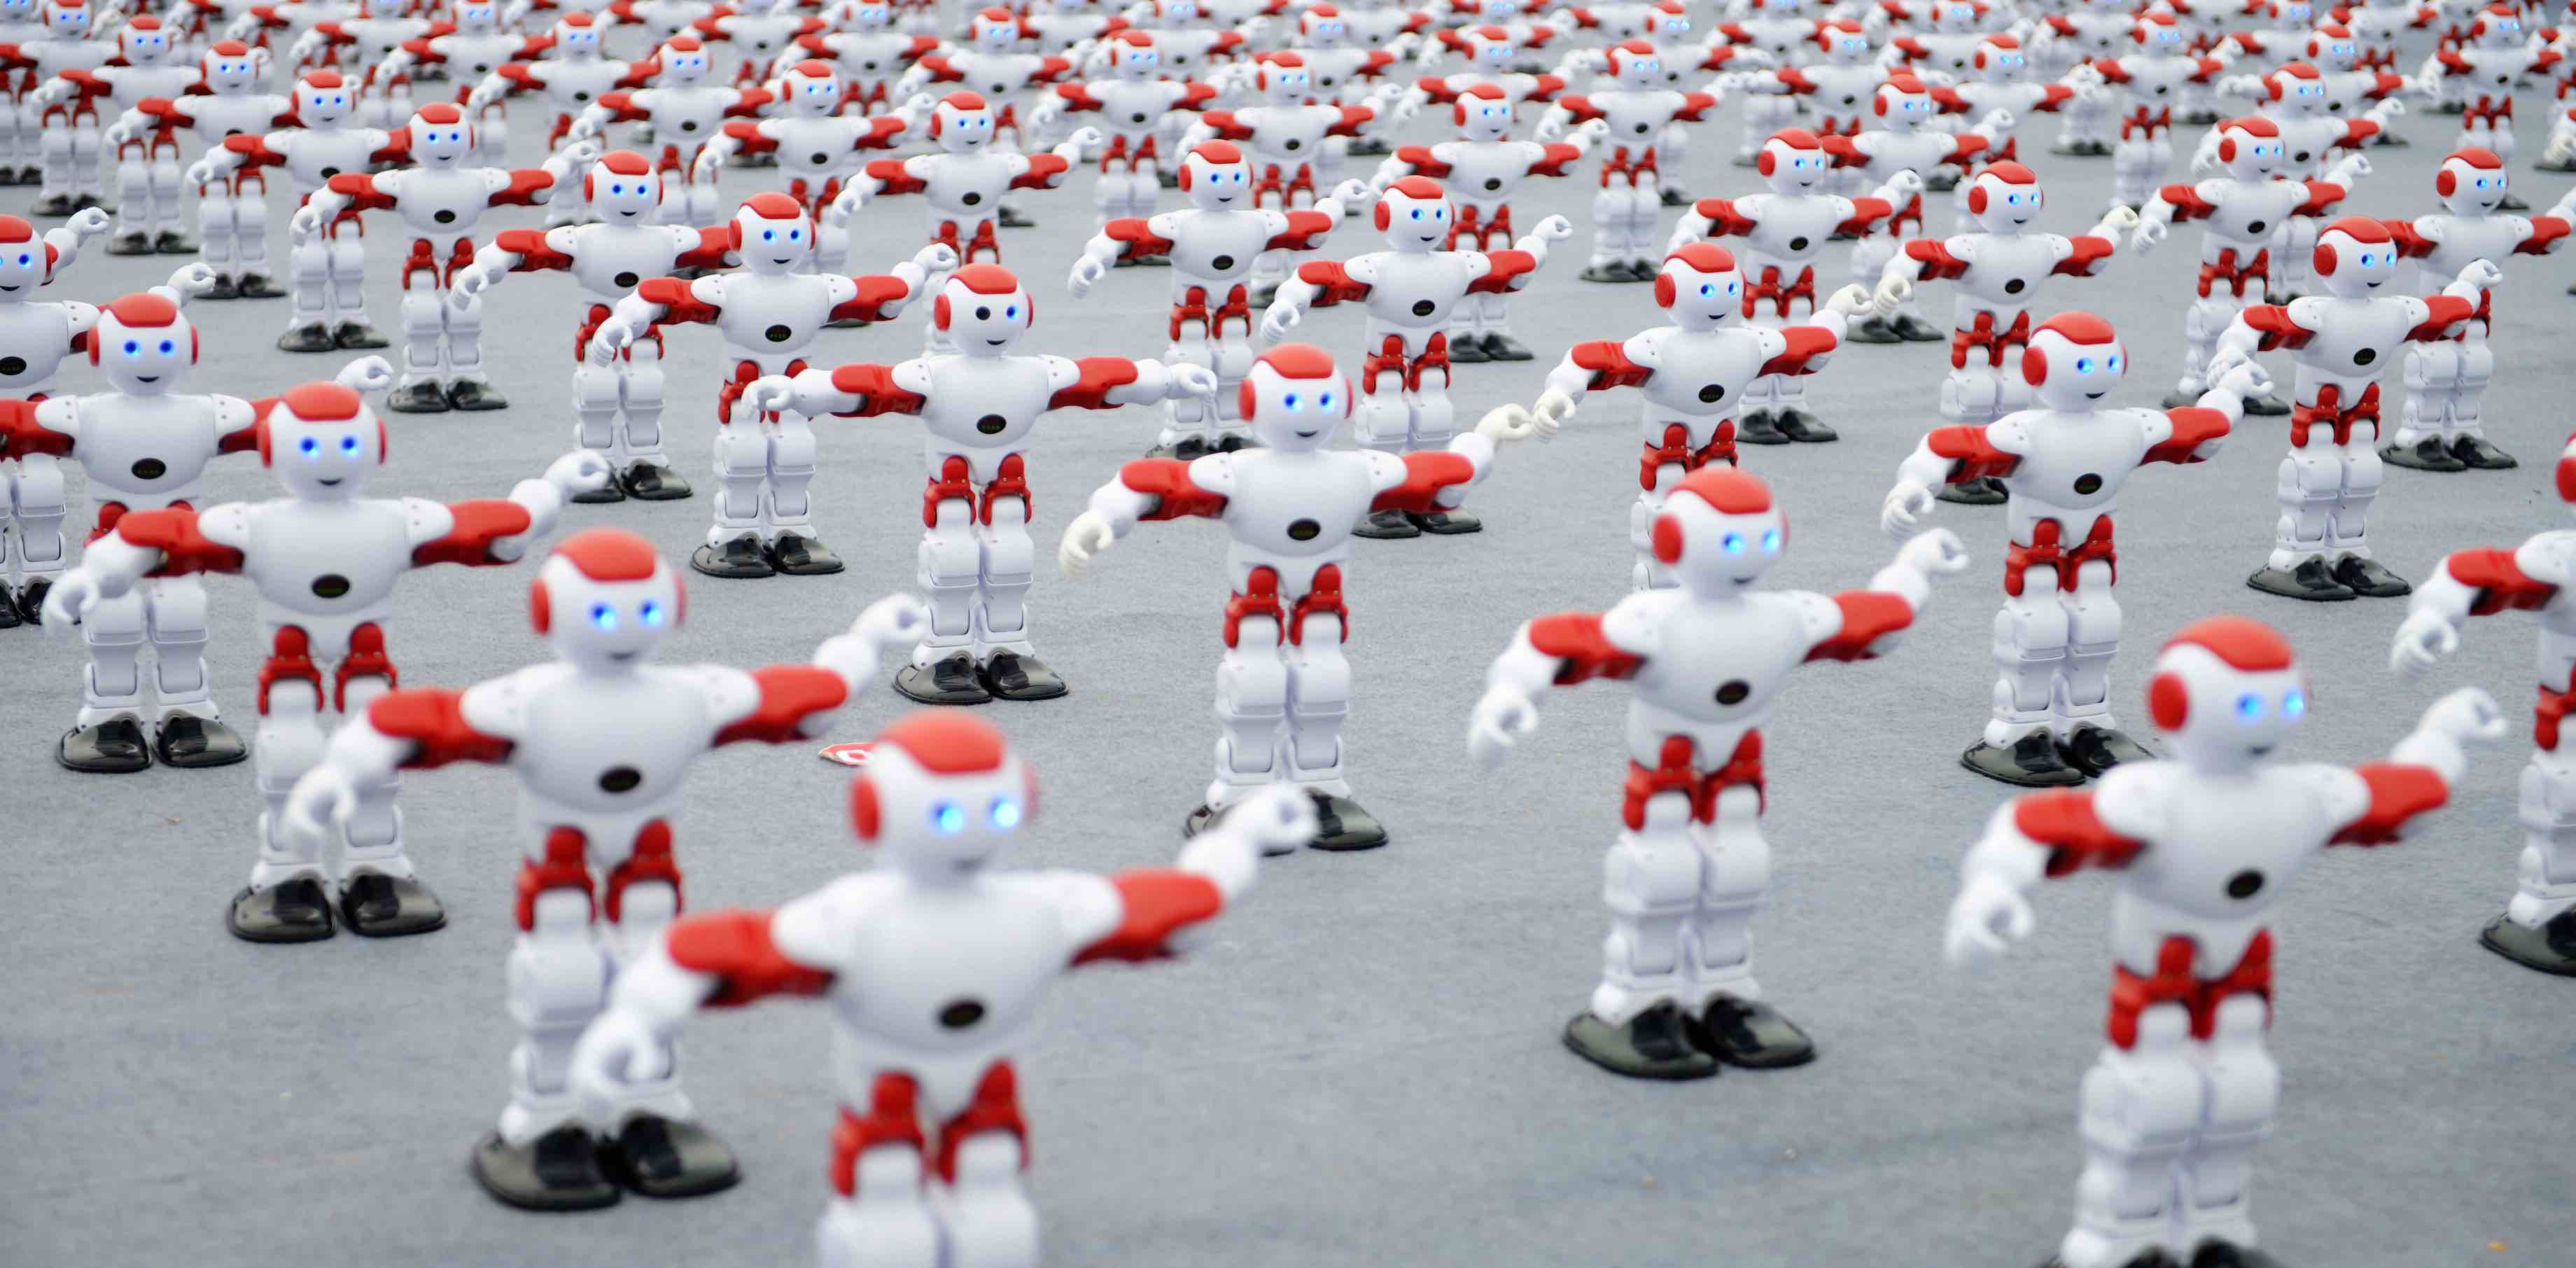 1050 dancing robots at the Qingdao International Beer Festival 2016 (Photo: VCG via Getty)